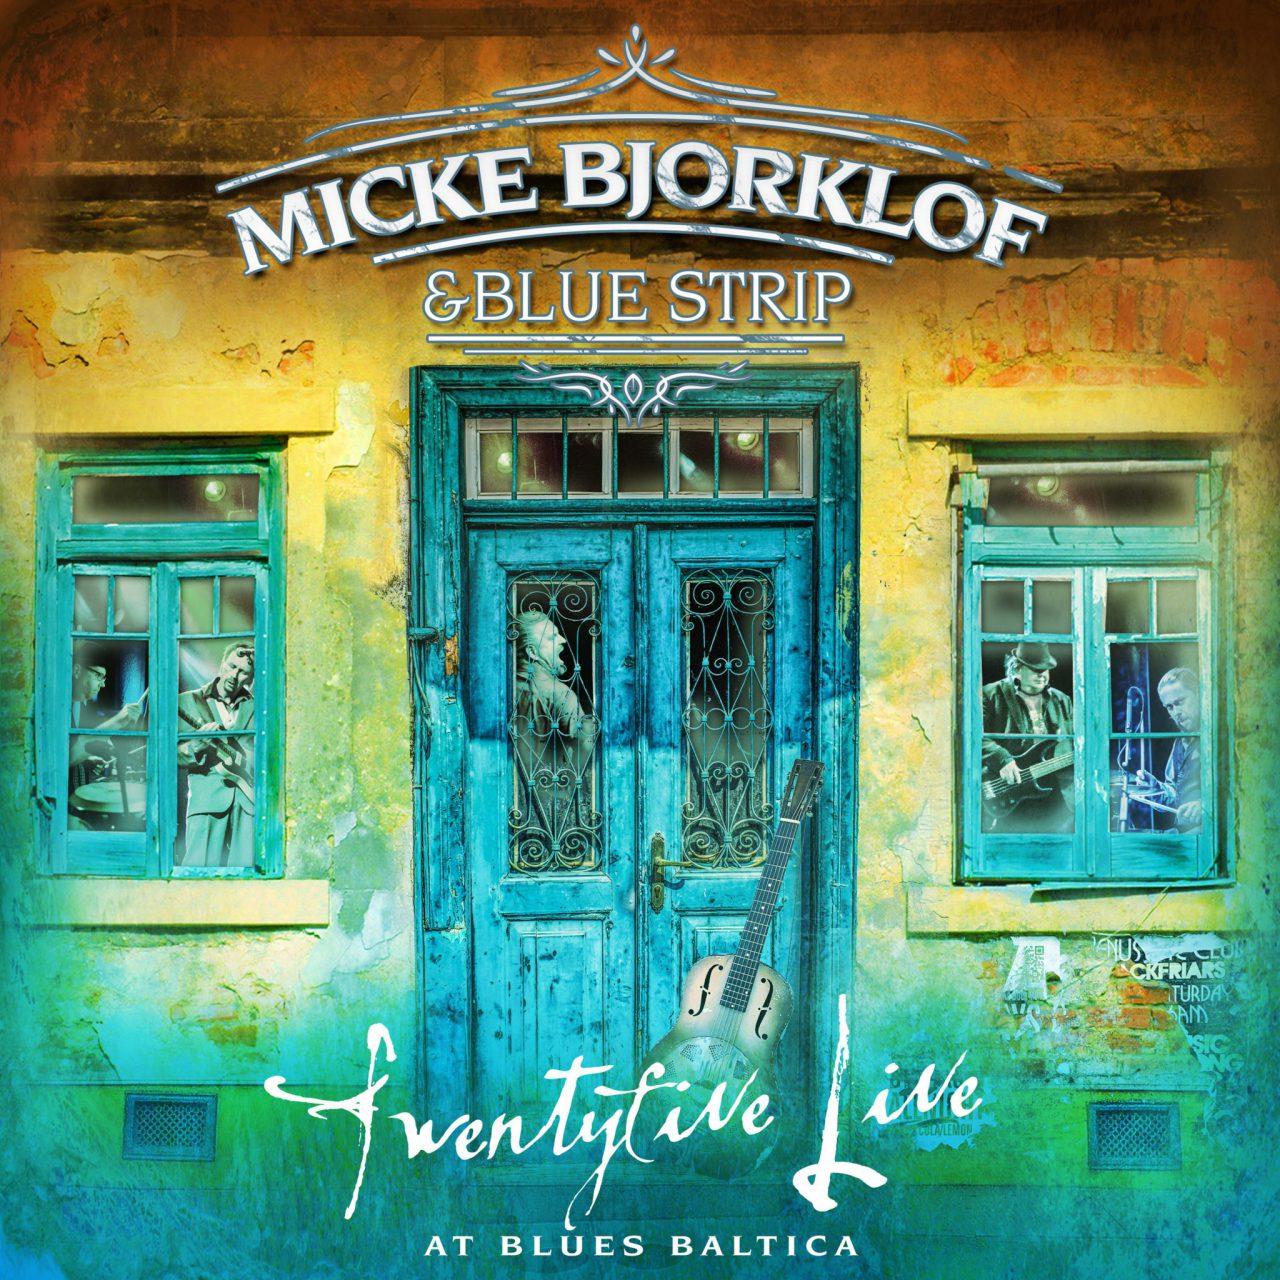 Micke Bjorklof & Blue Strip – Twentyfive Live at Blues Baltica